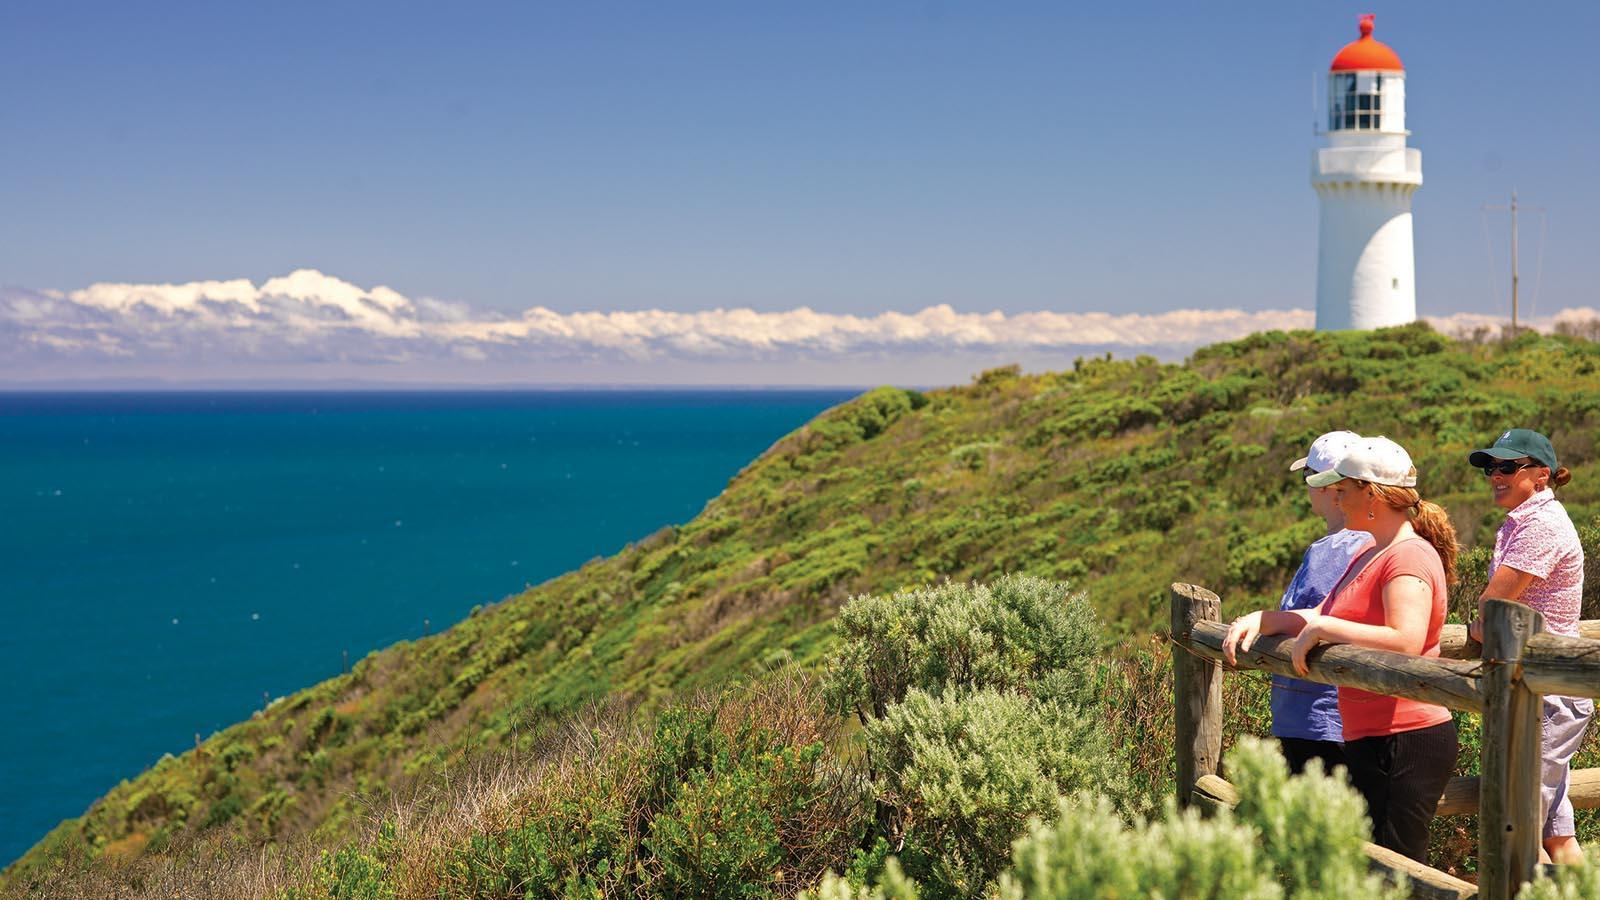 Cape Schanck Lighthouse, Mornington Peninsula, Victoria, Australia